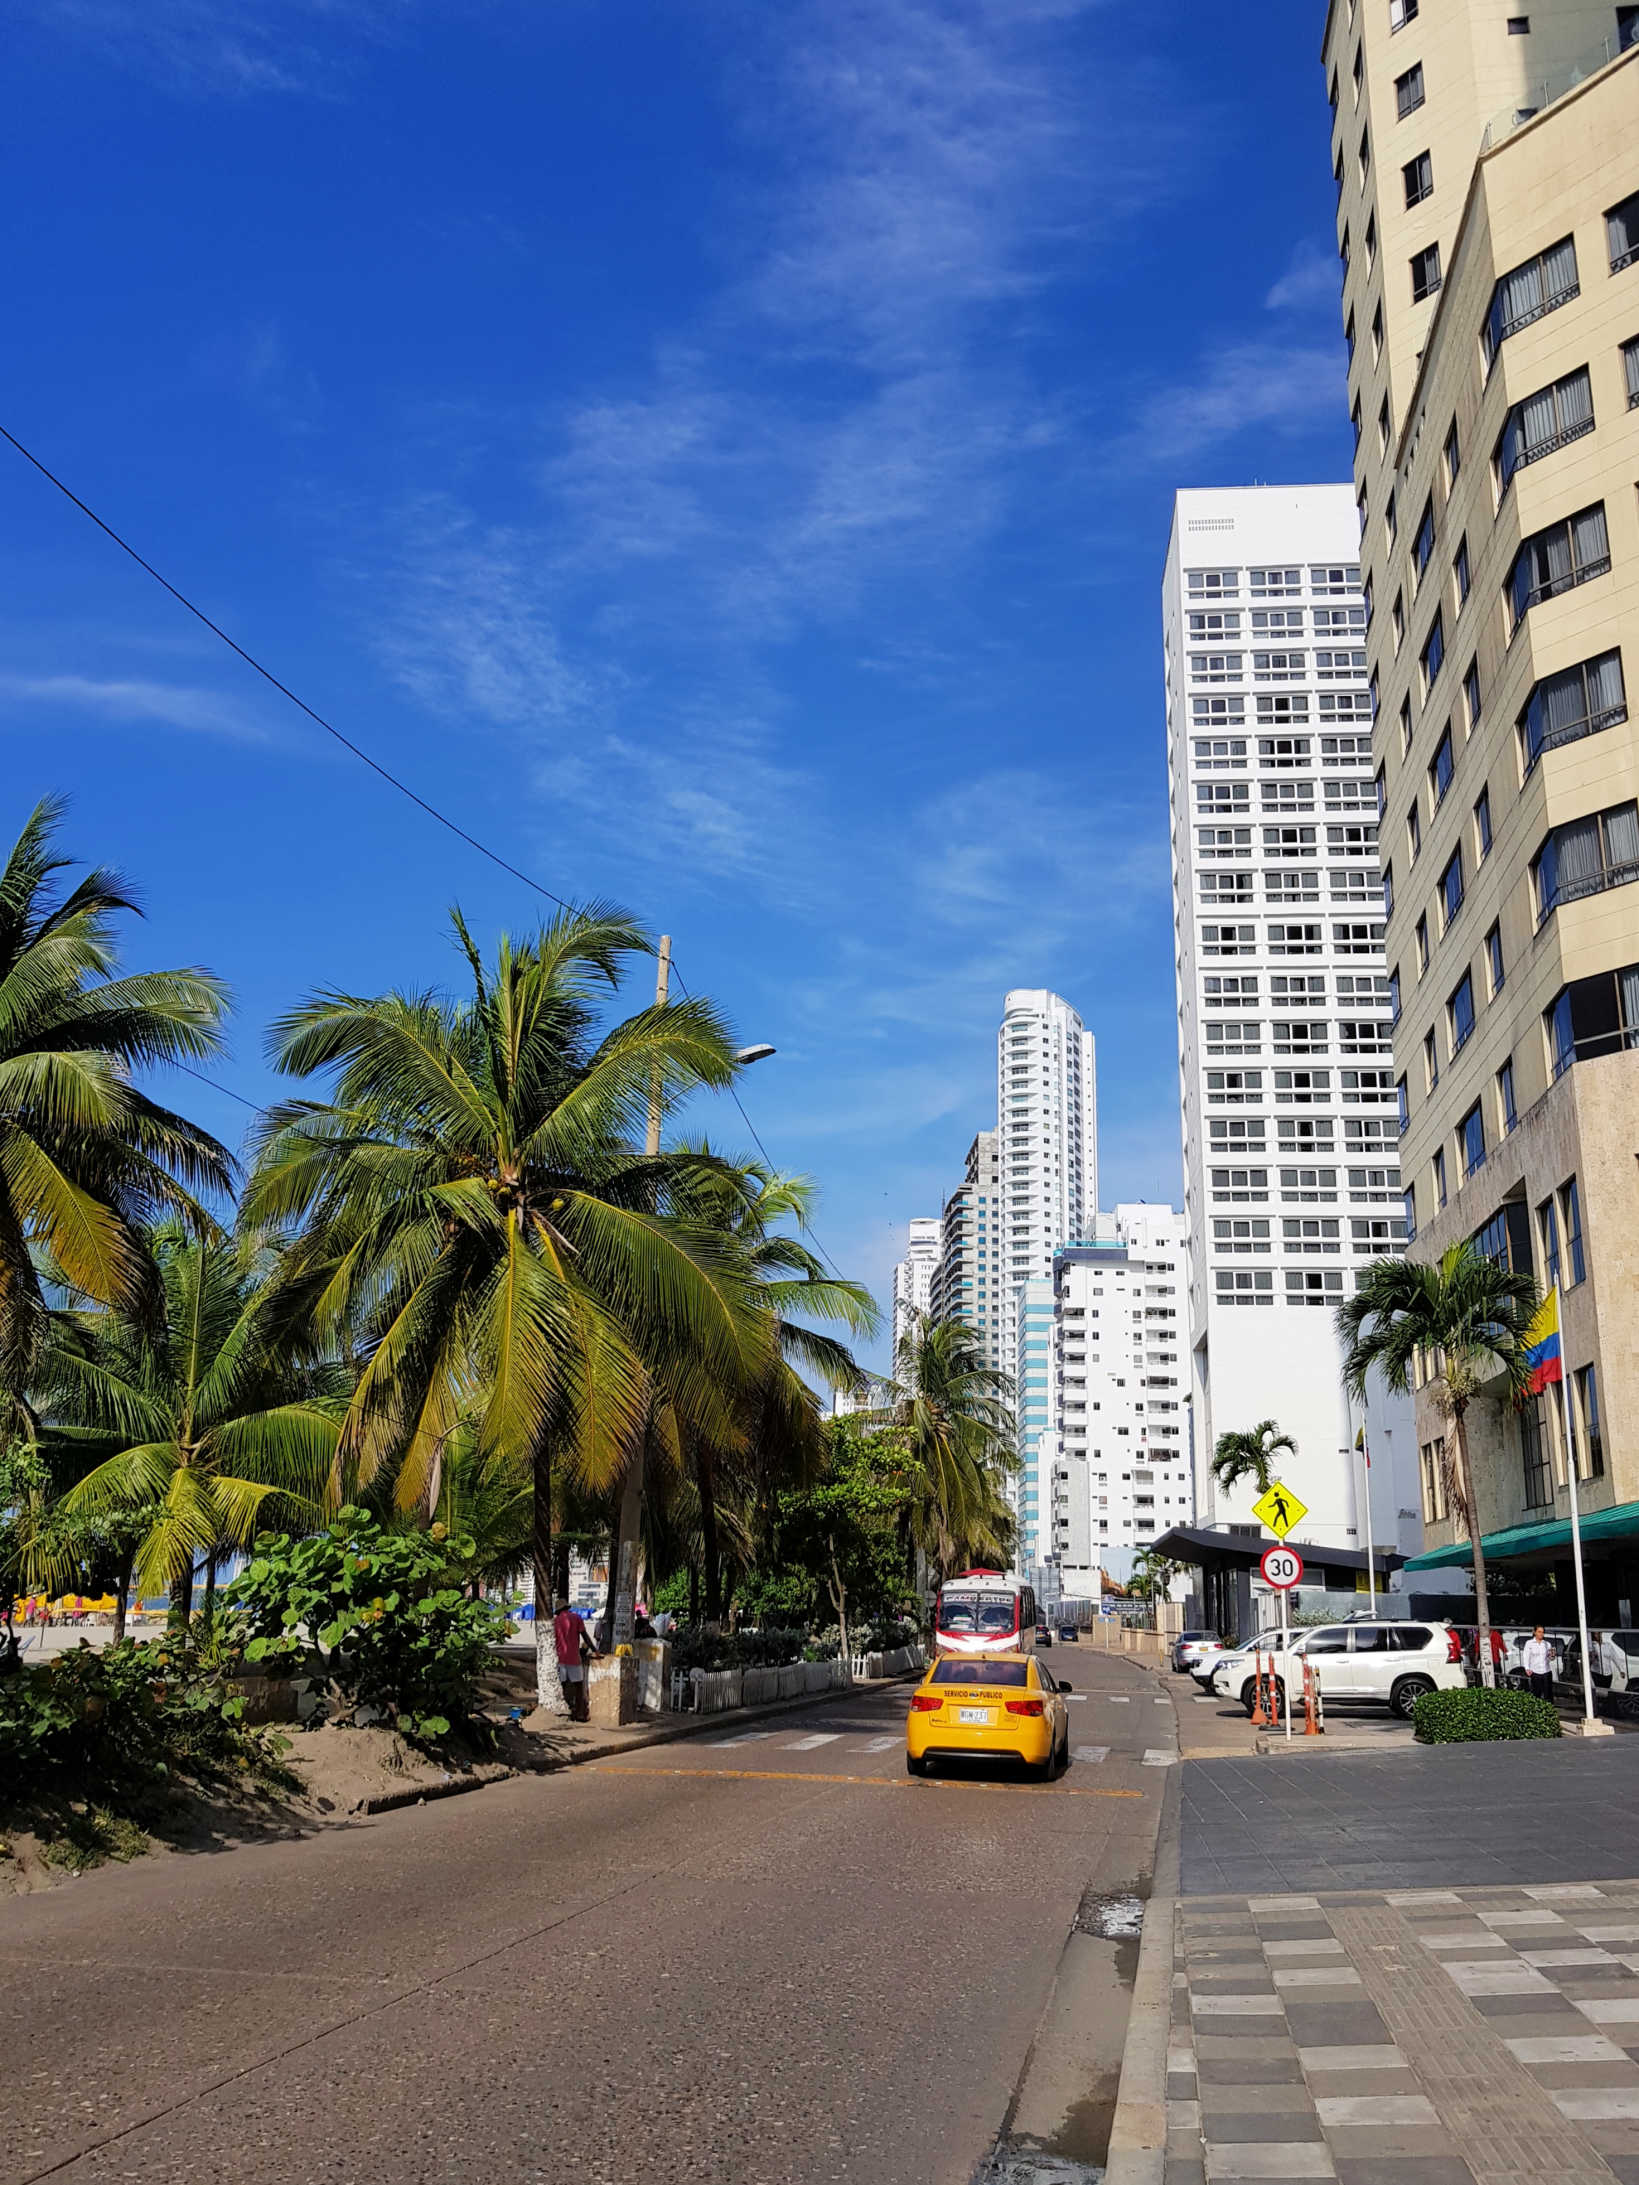 Reisblog Colombia Cartagena